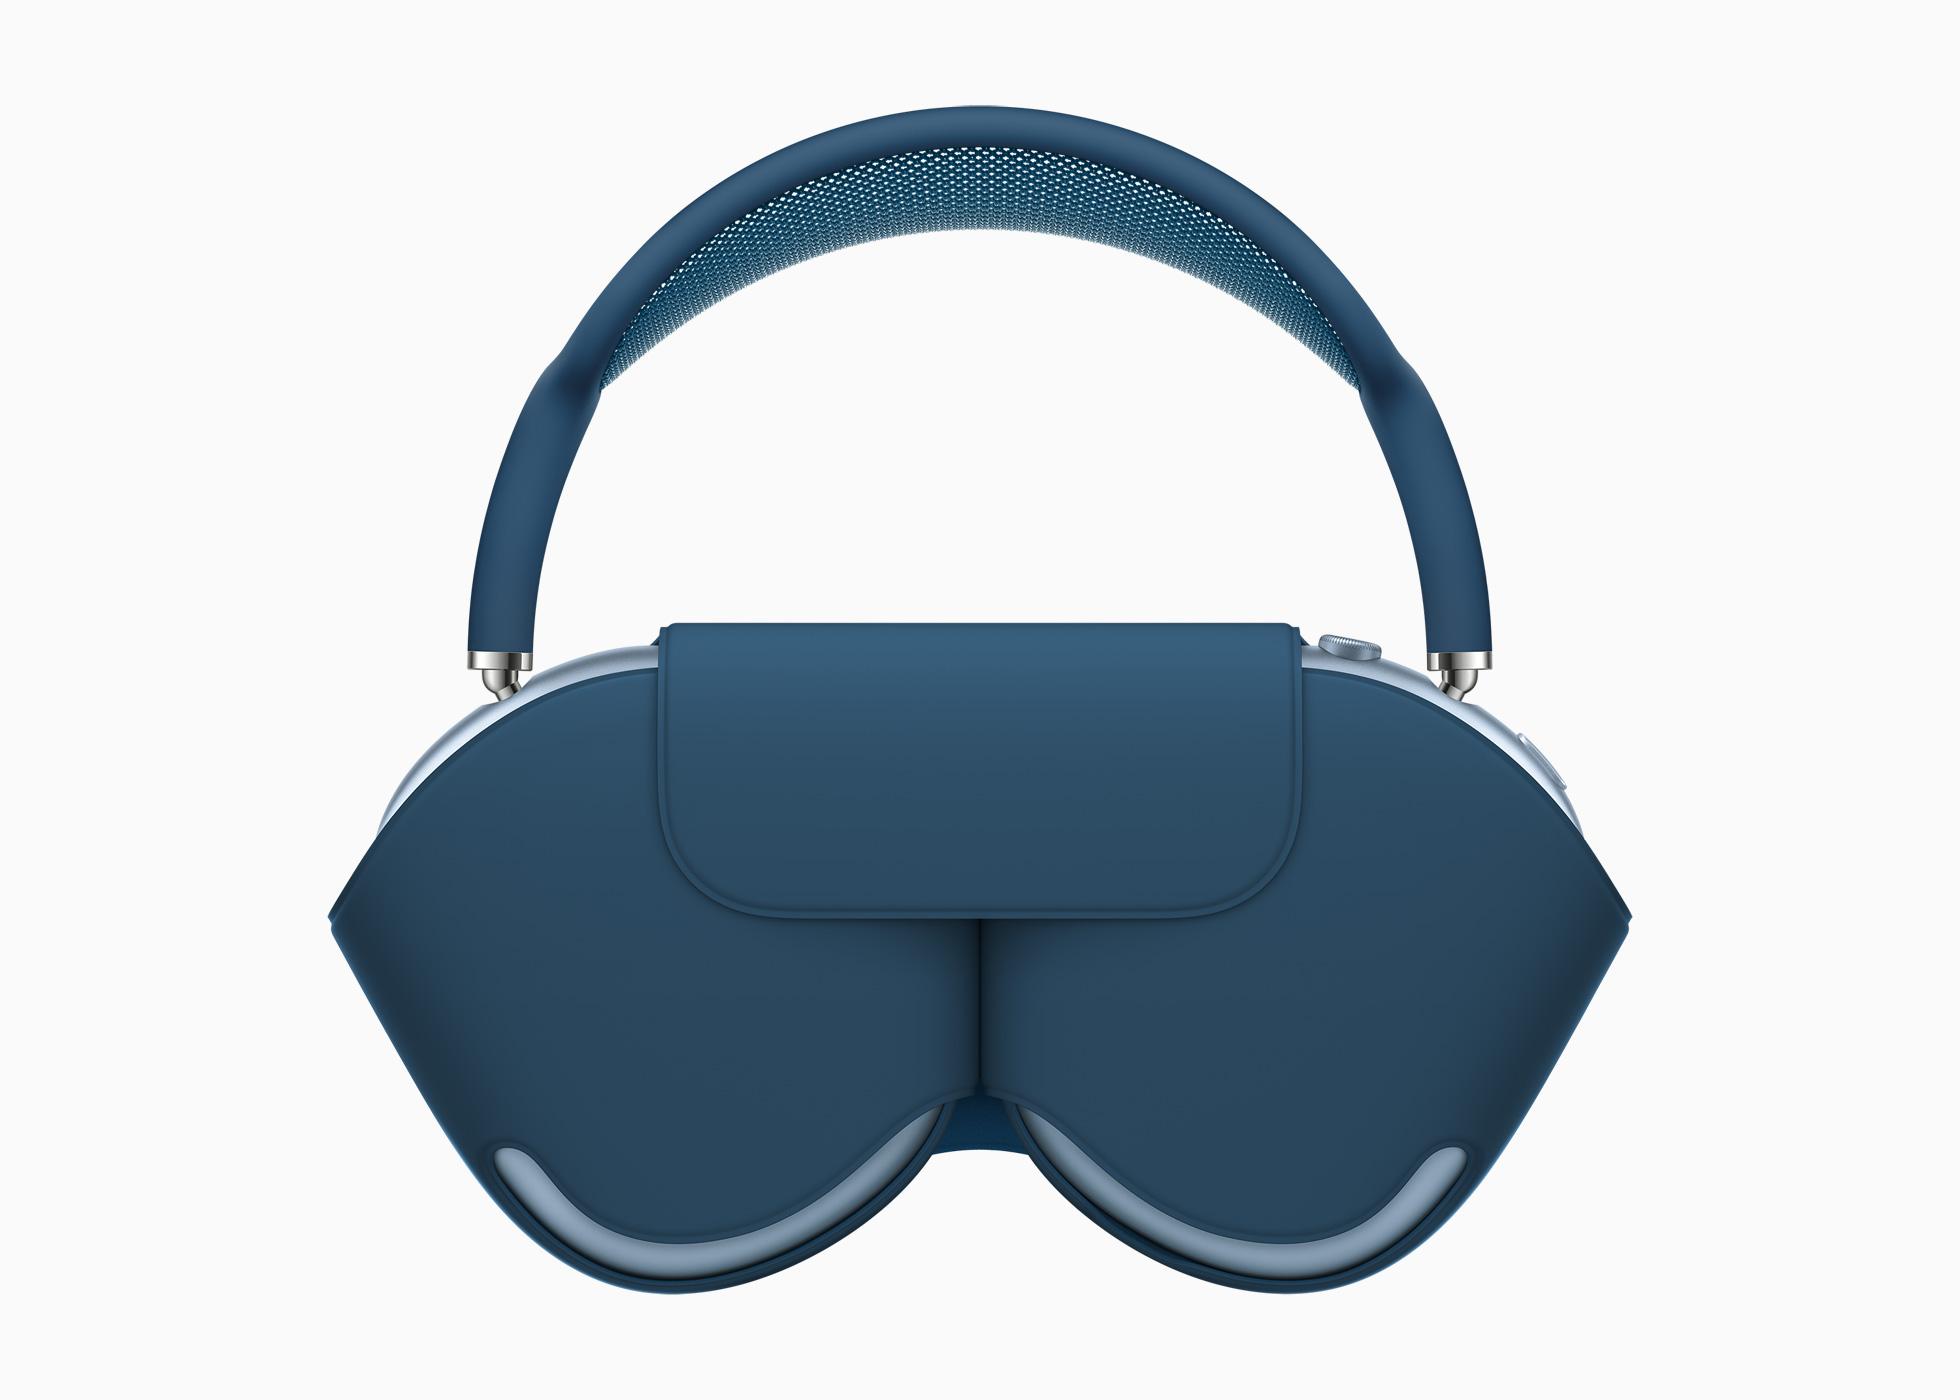 apple_airpods-max_smart-case-blue_12082020_big.jpg.large_2x.jpg